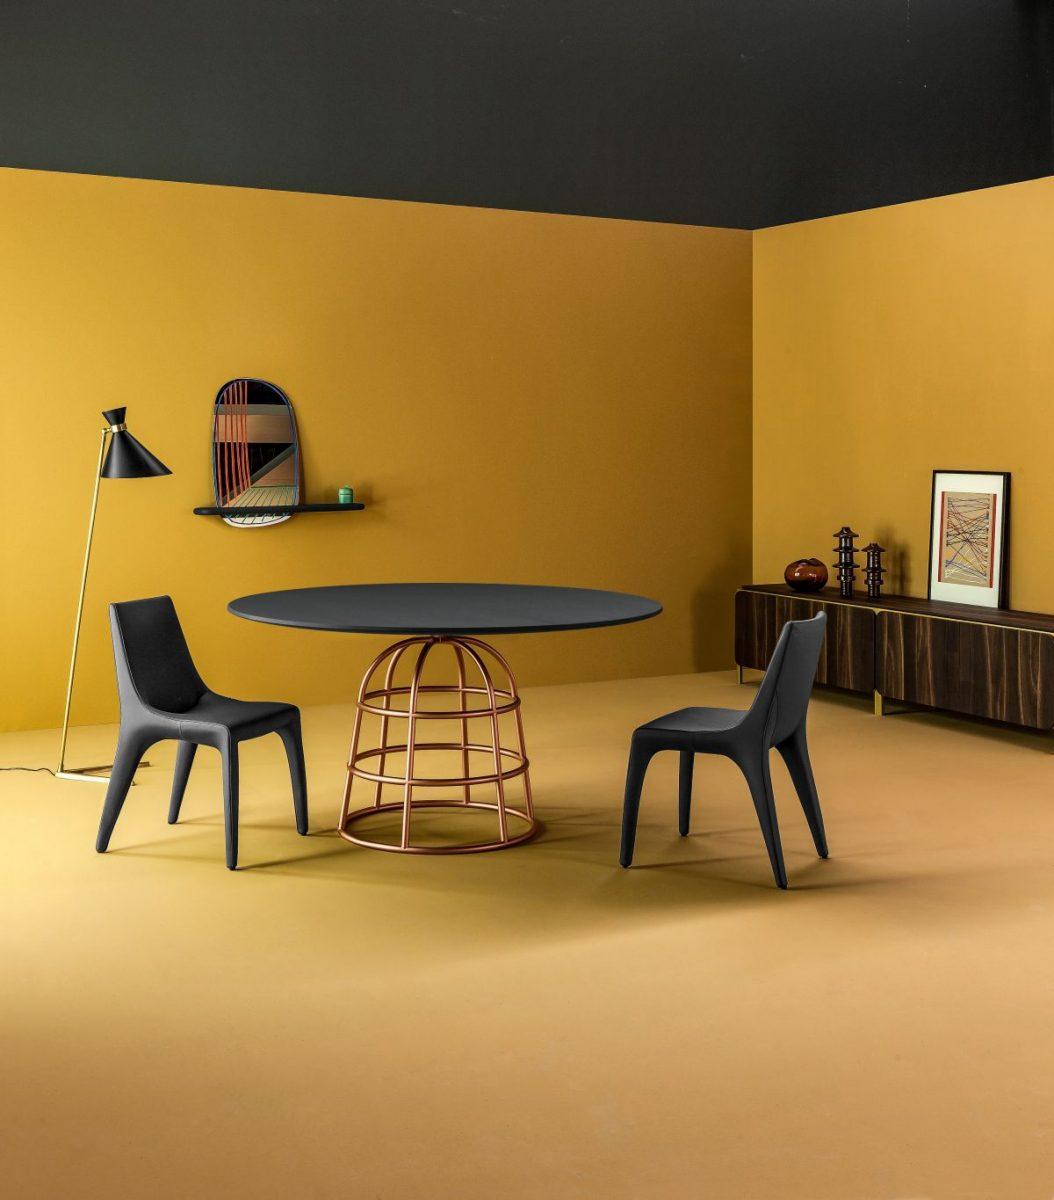 obr.5_go-modern-furniture_bonaldo-mass-dining-table-1200x1200.jpg